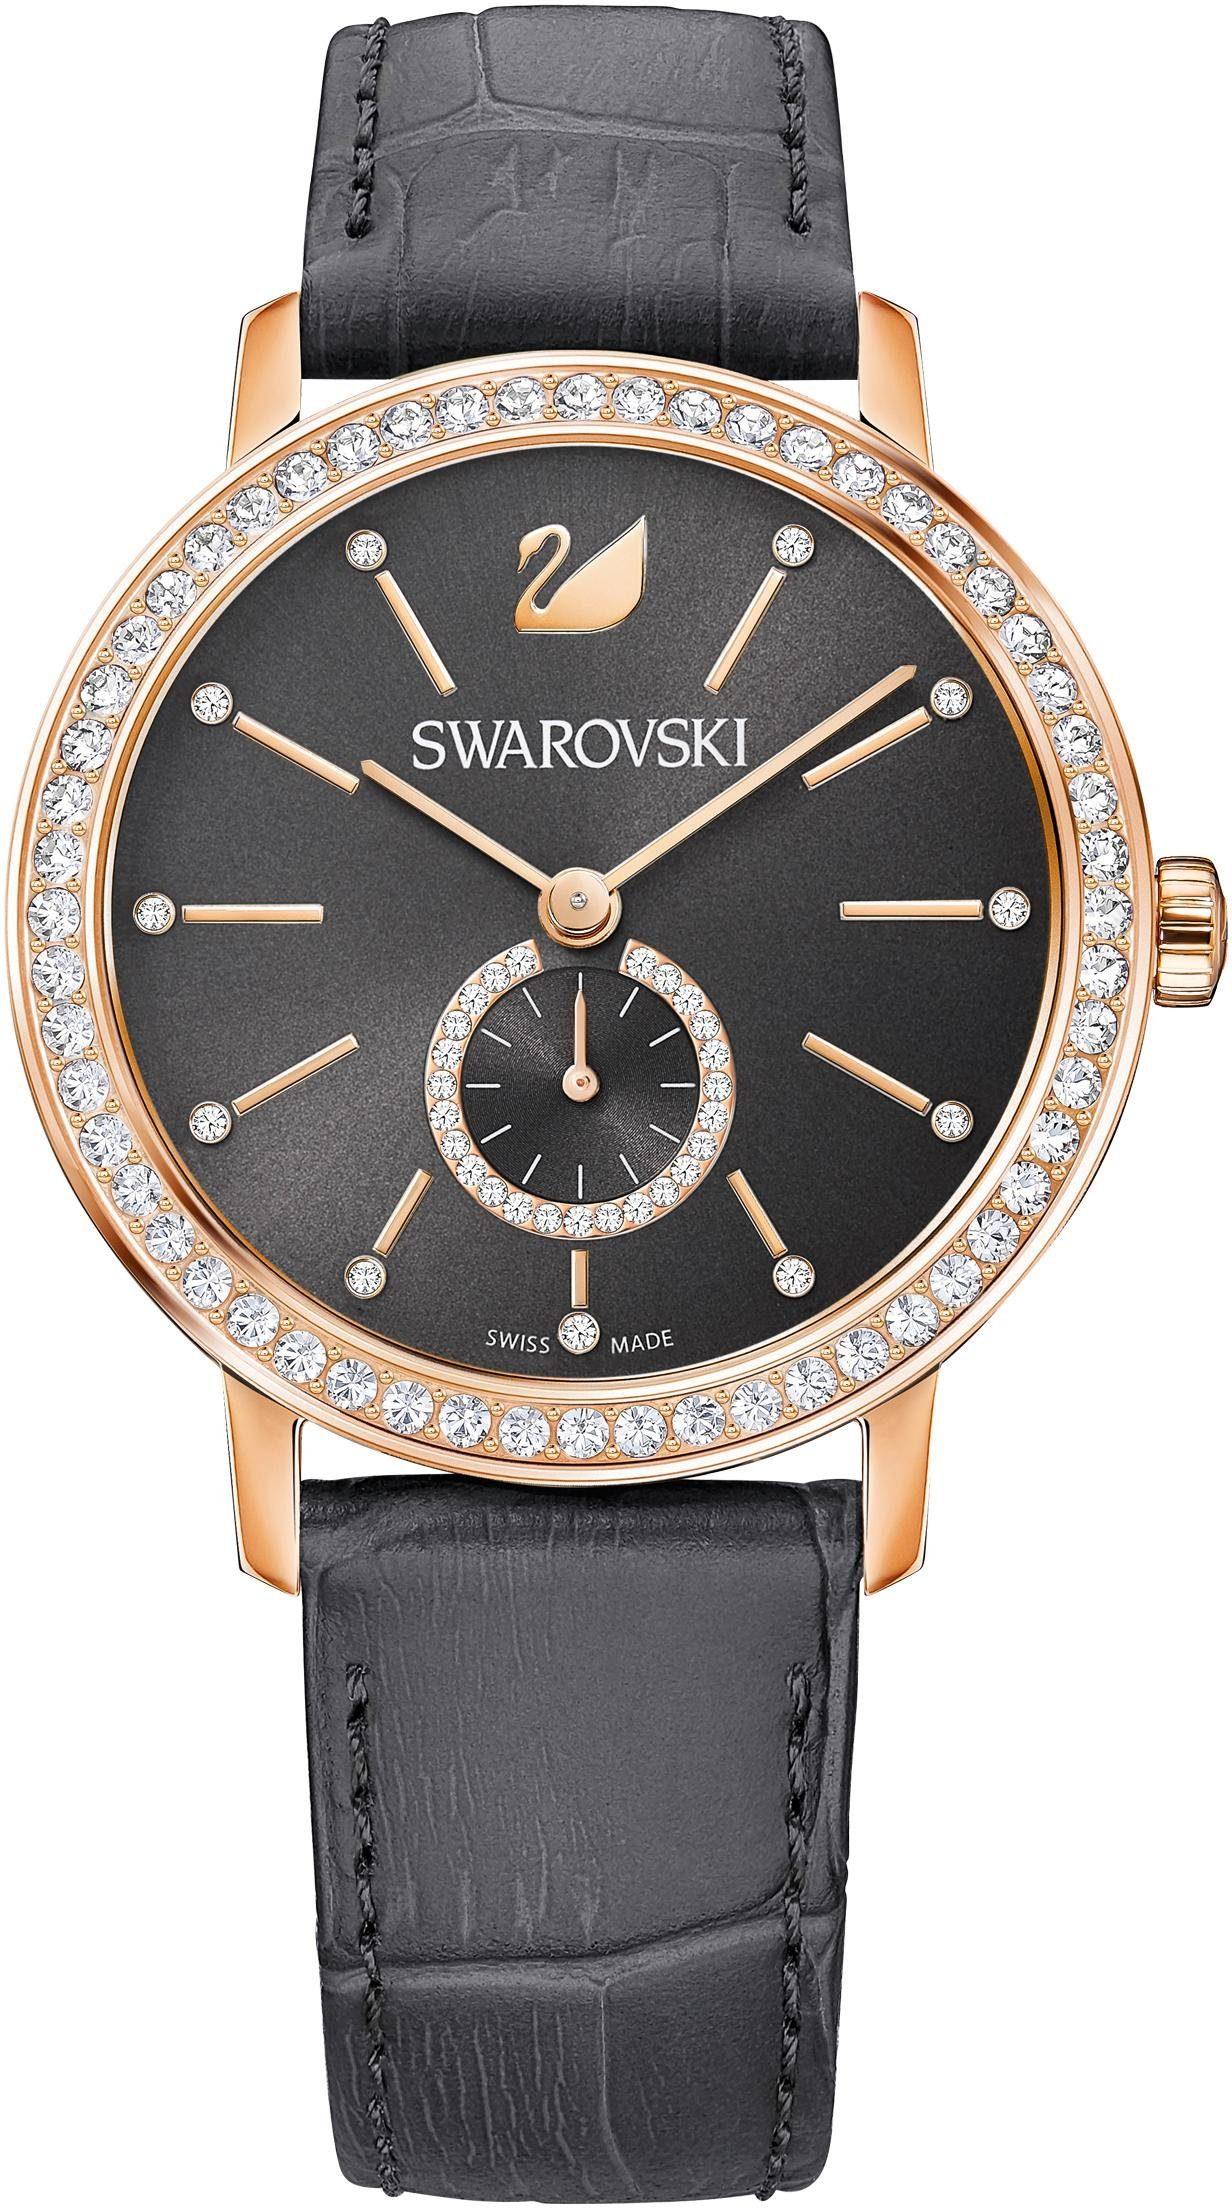 Swarovski Schweizer Uhr »Graceful Lady Uhr, Lederarmband, grau, roséfarben, 5295389«